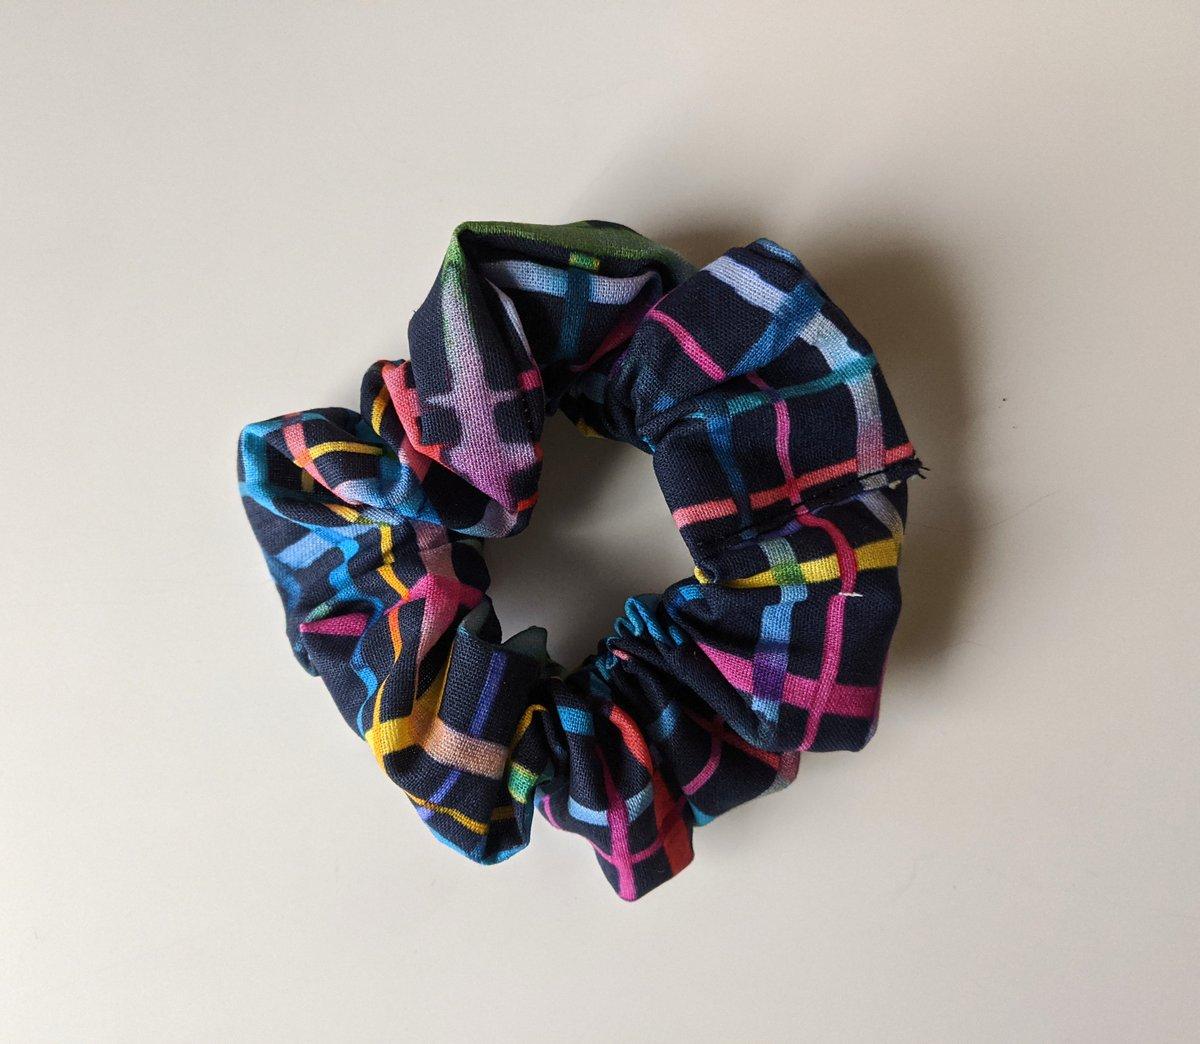 Image of Scrunchie #6